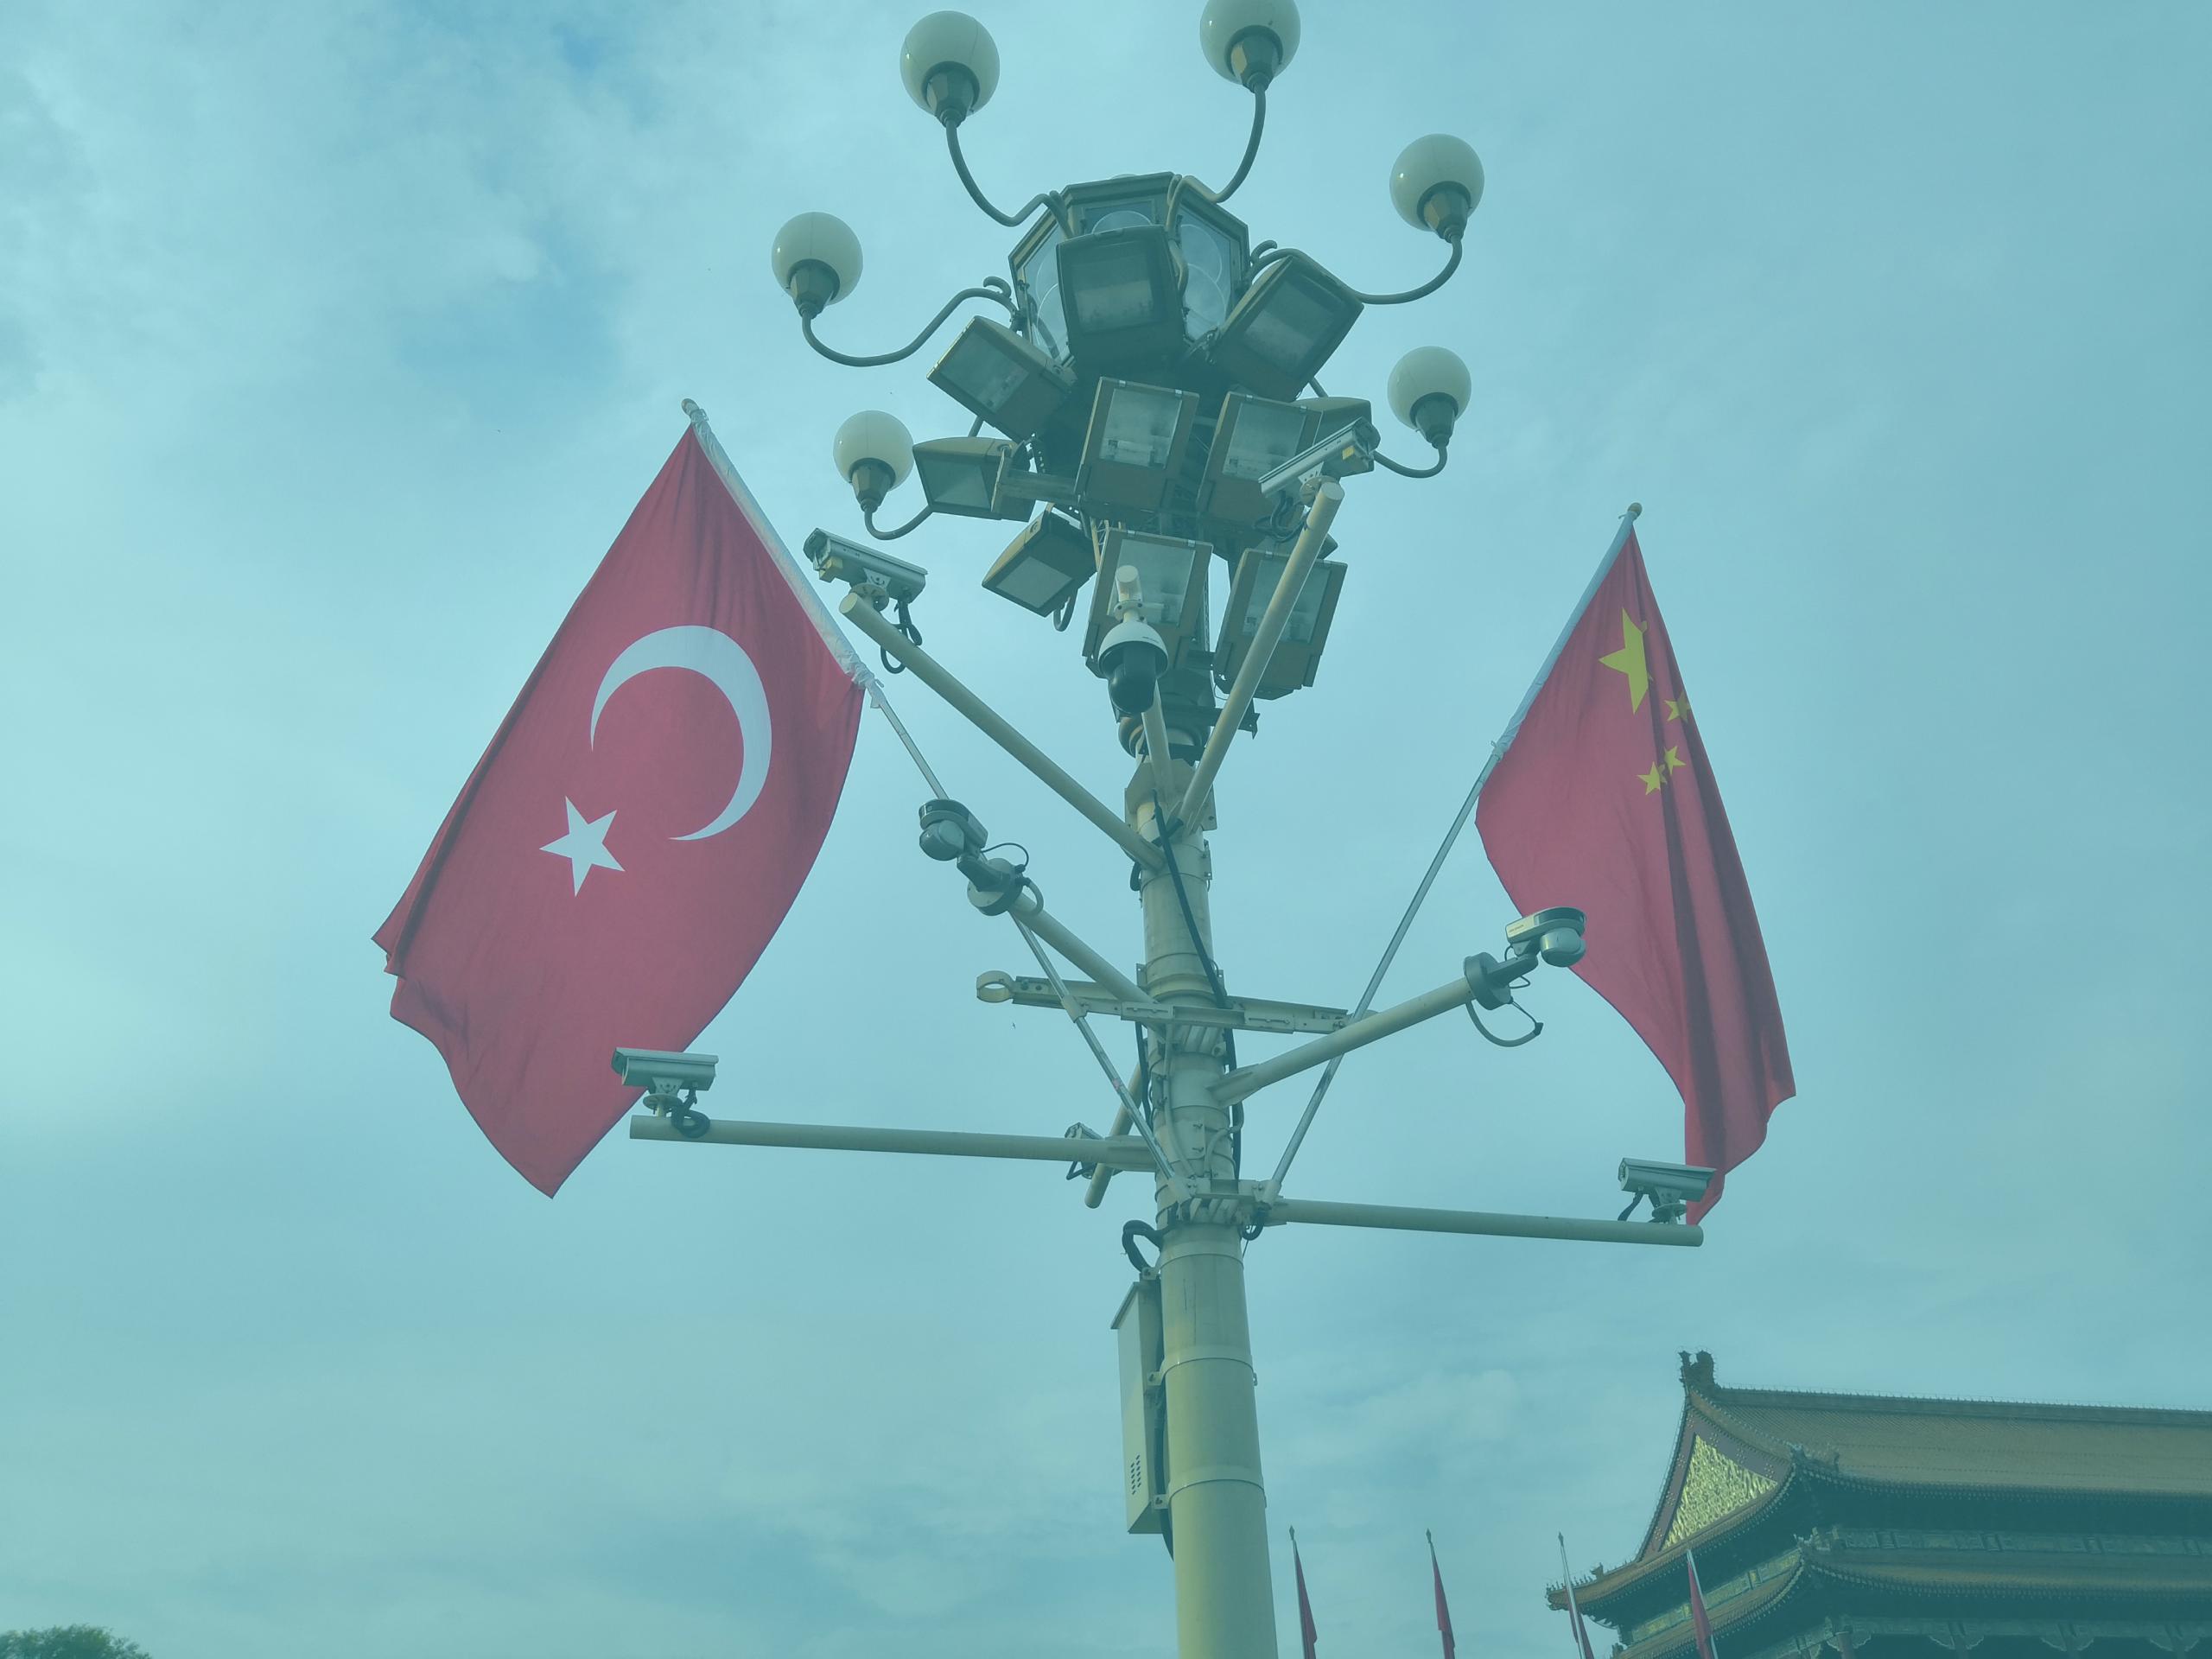 Serdar San and Davut Akca – How Turkey's democratic backsliding compromises the international dimension of democratization